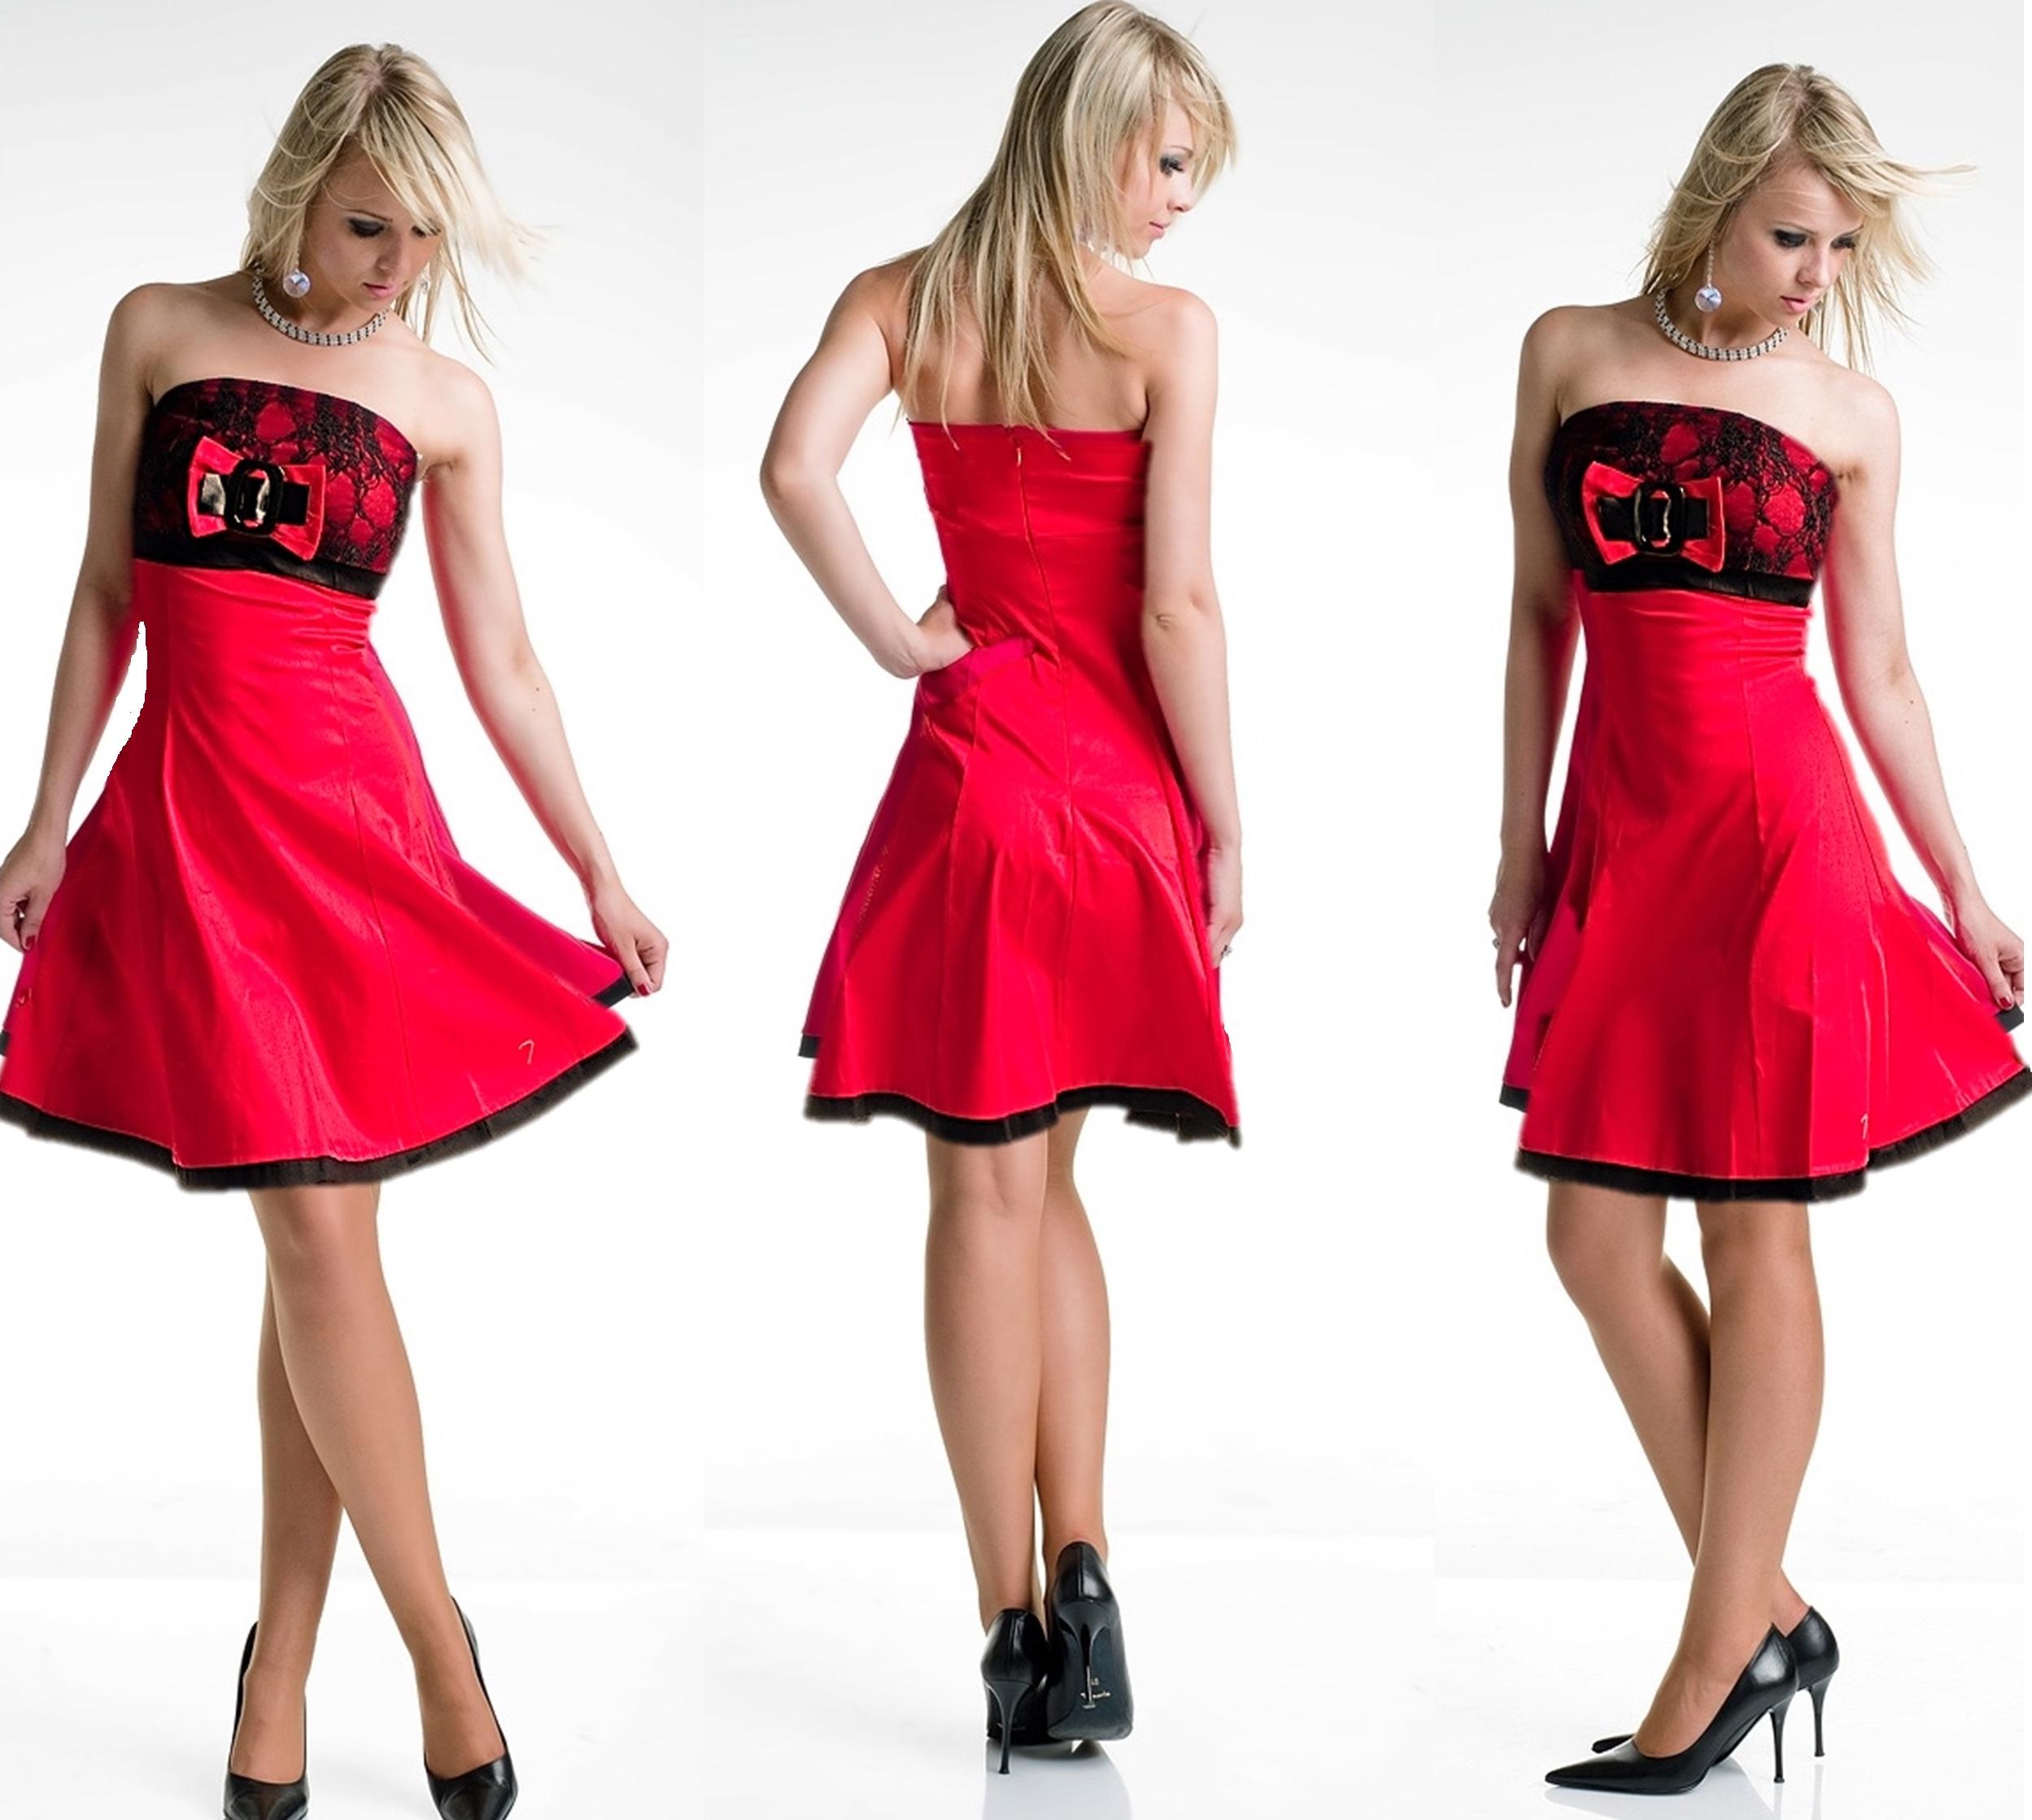 Kleid Minikleid Spitze Abendkleid Satin Schleife Bandeaukleid ...